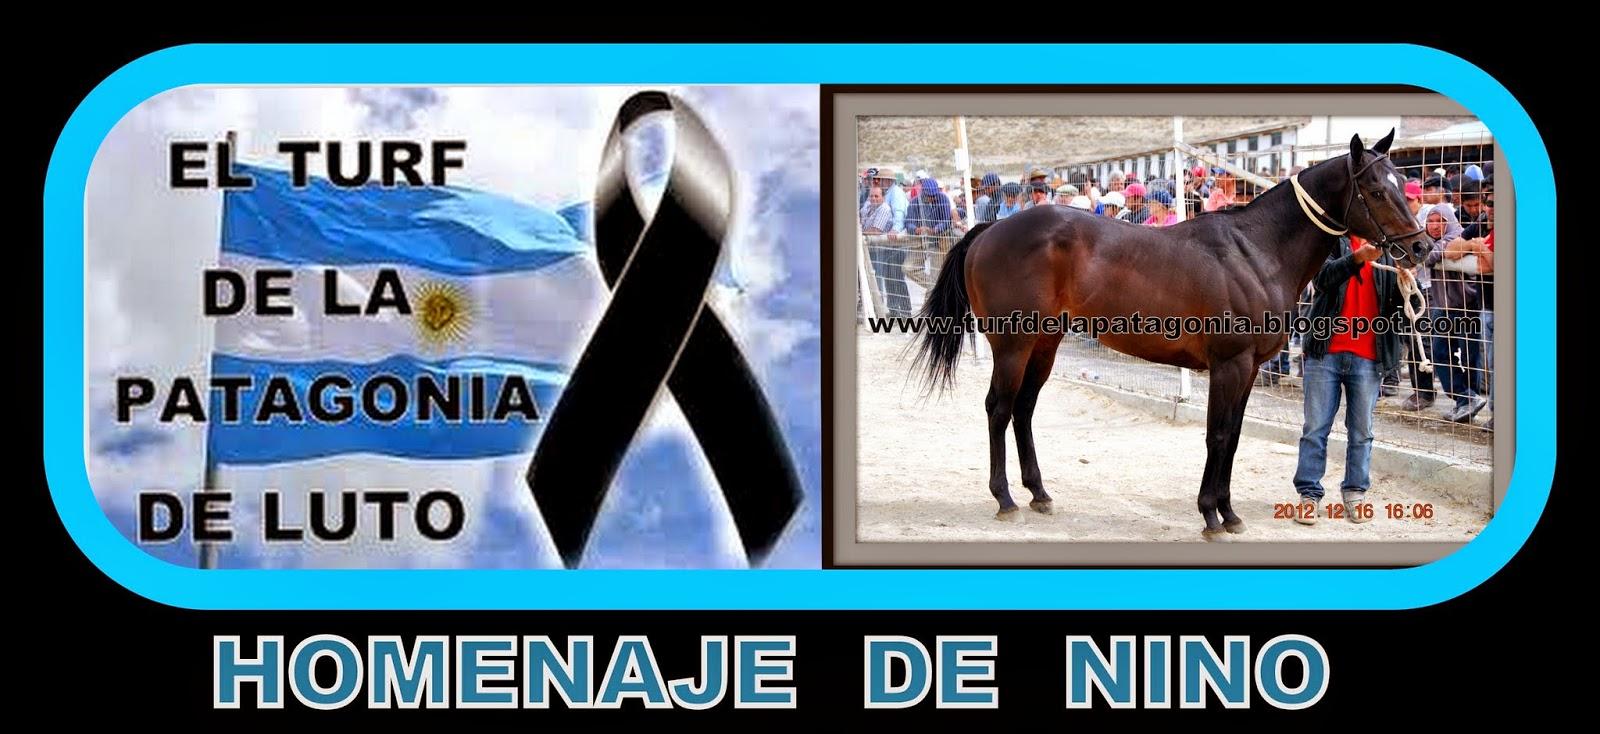 http://turfdelapatagonia.blogspot.com.ar/2014/09/homenaje-de-nino.html